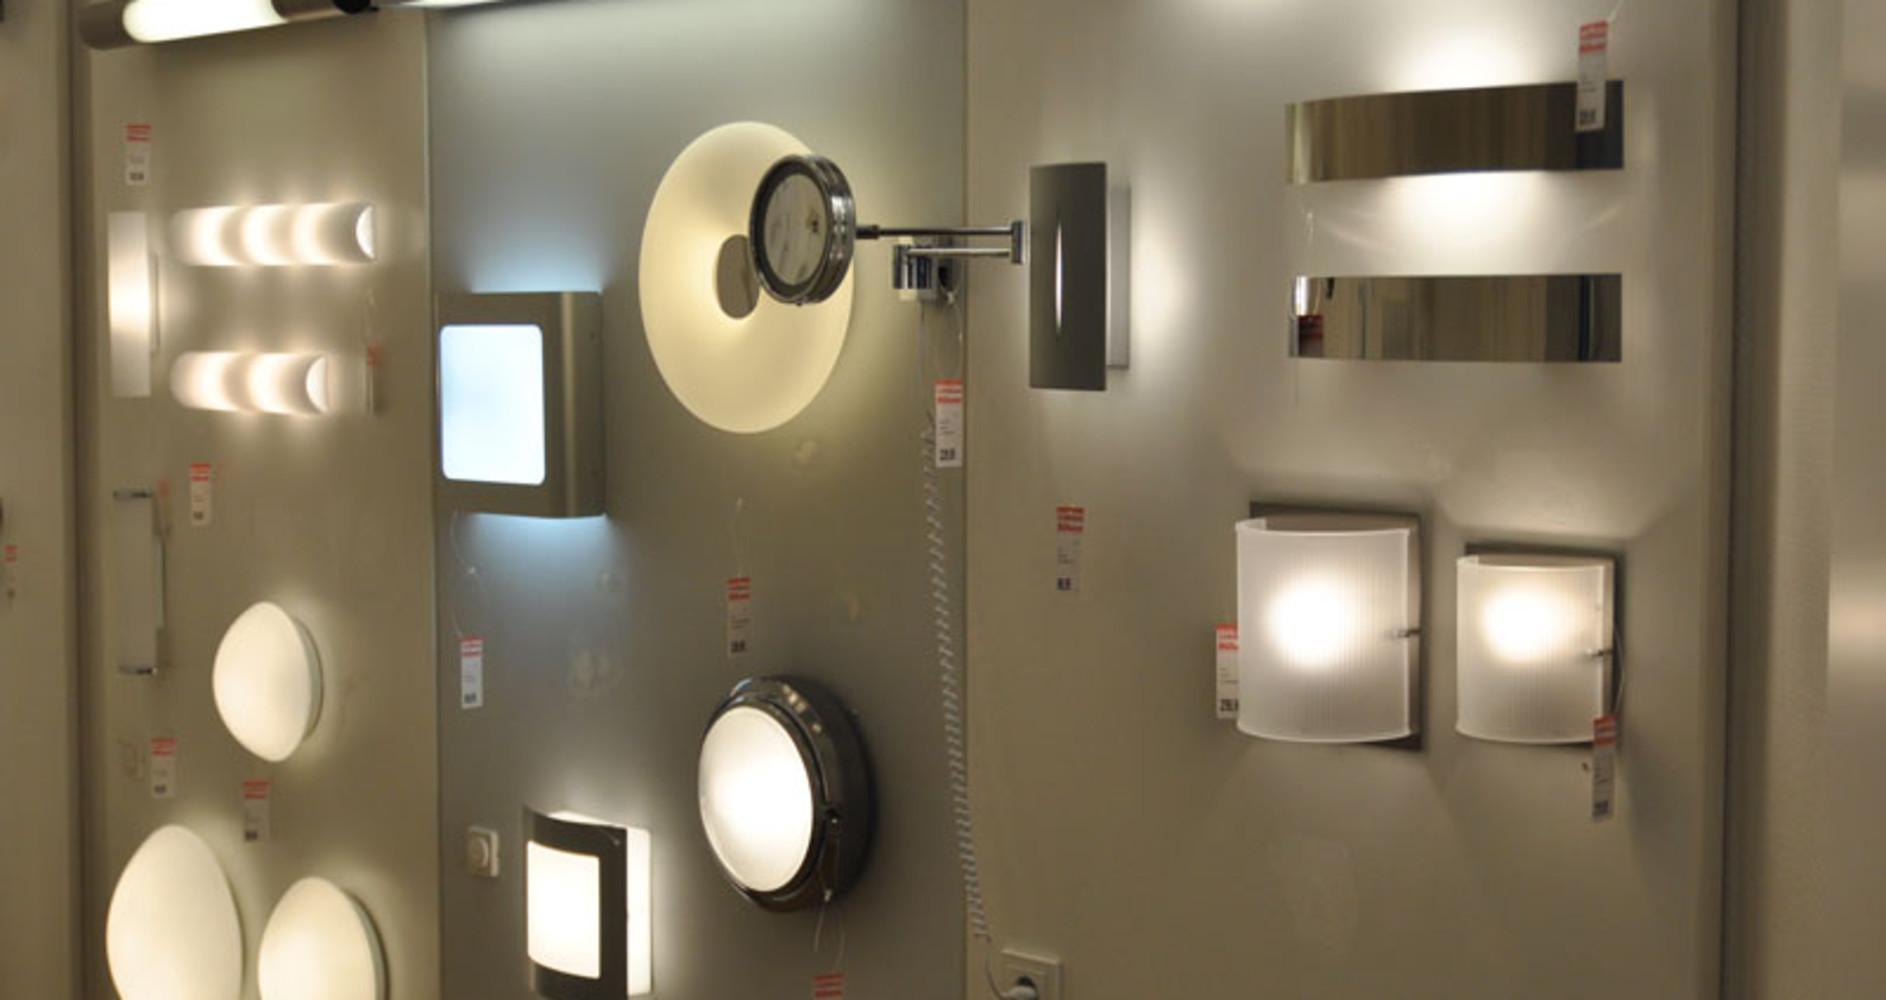 Lichthaus Hubner Ihr Lampengeschaft In Berlin Pankow